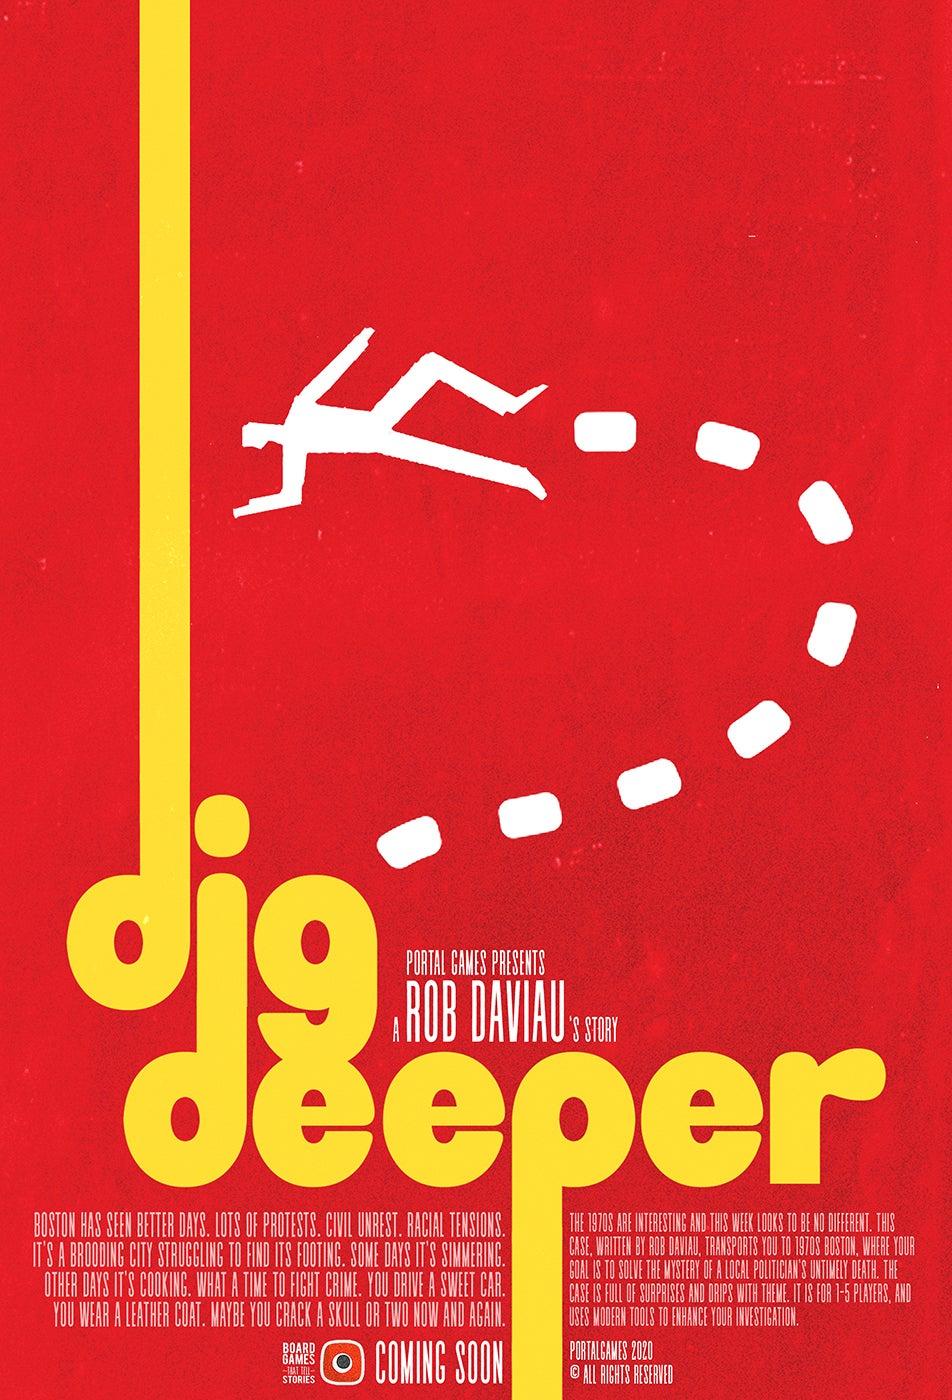 detective-board-game-dig-deeper-full-poster.jpg